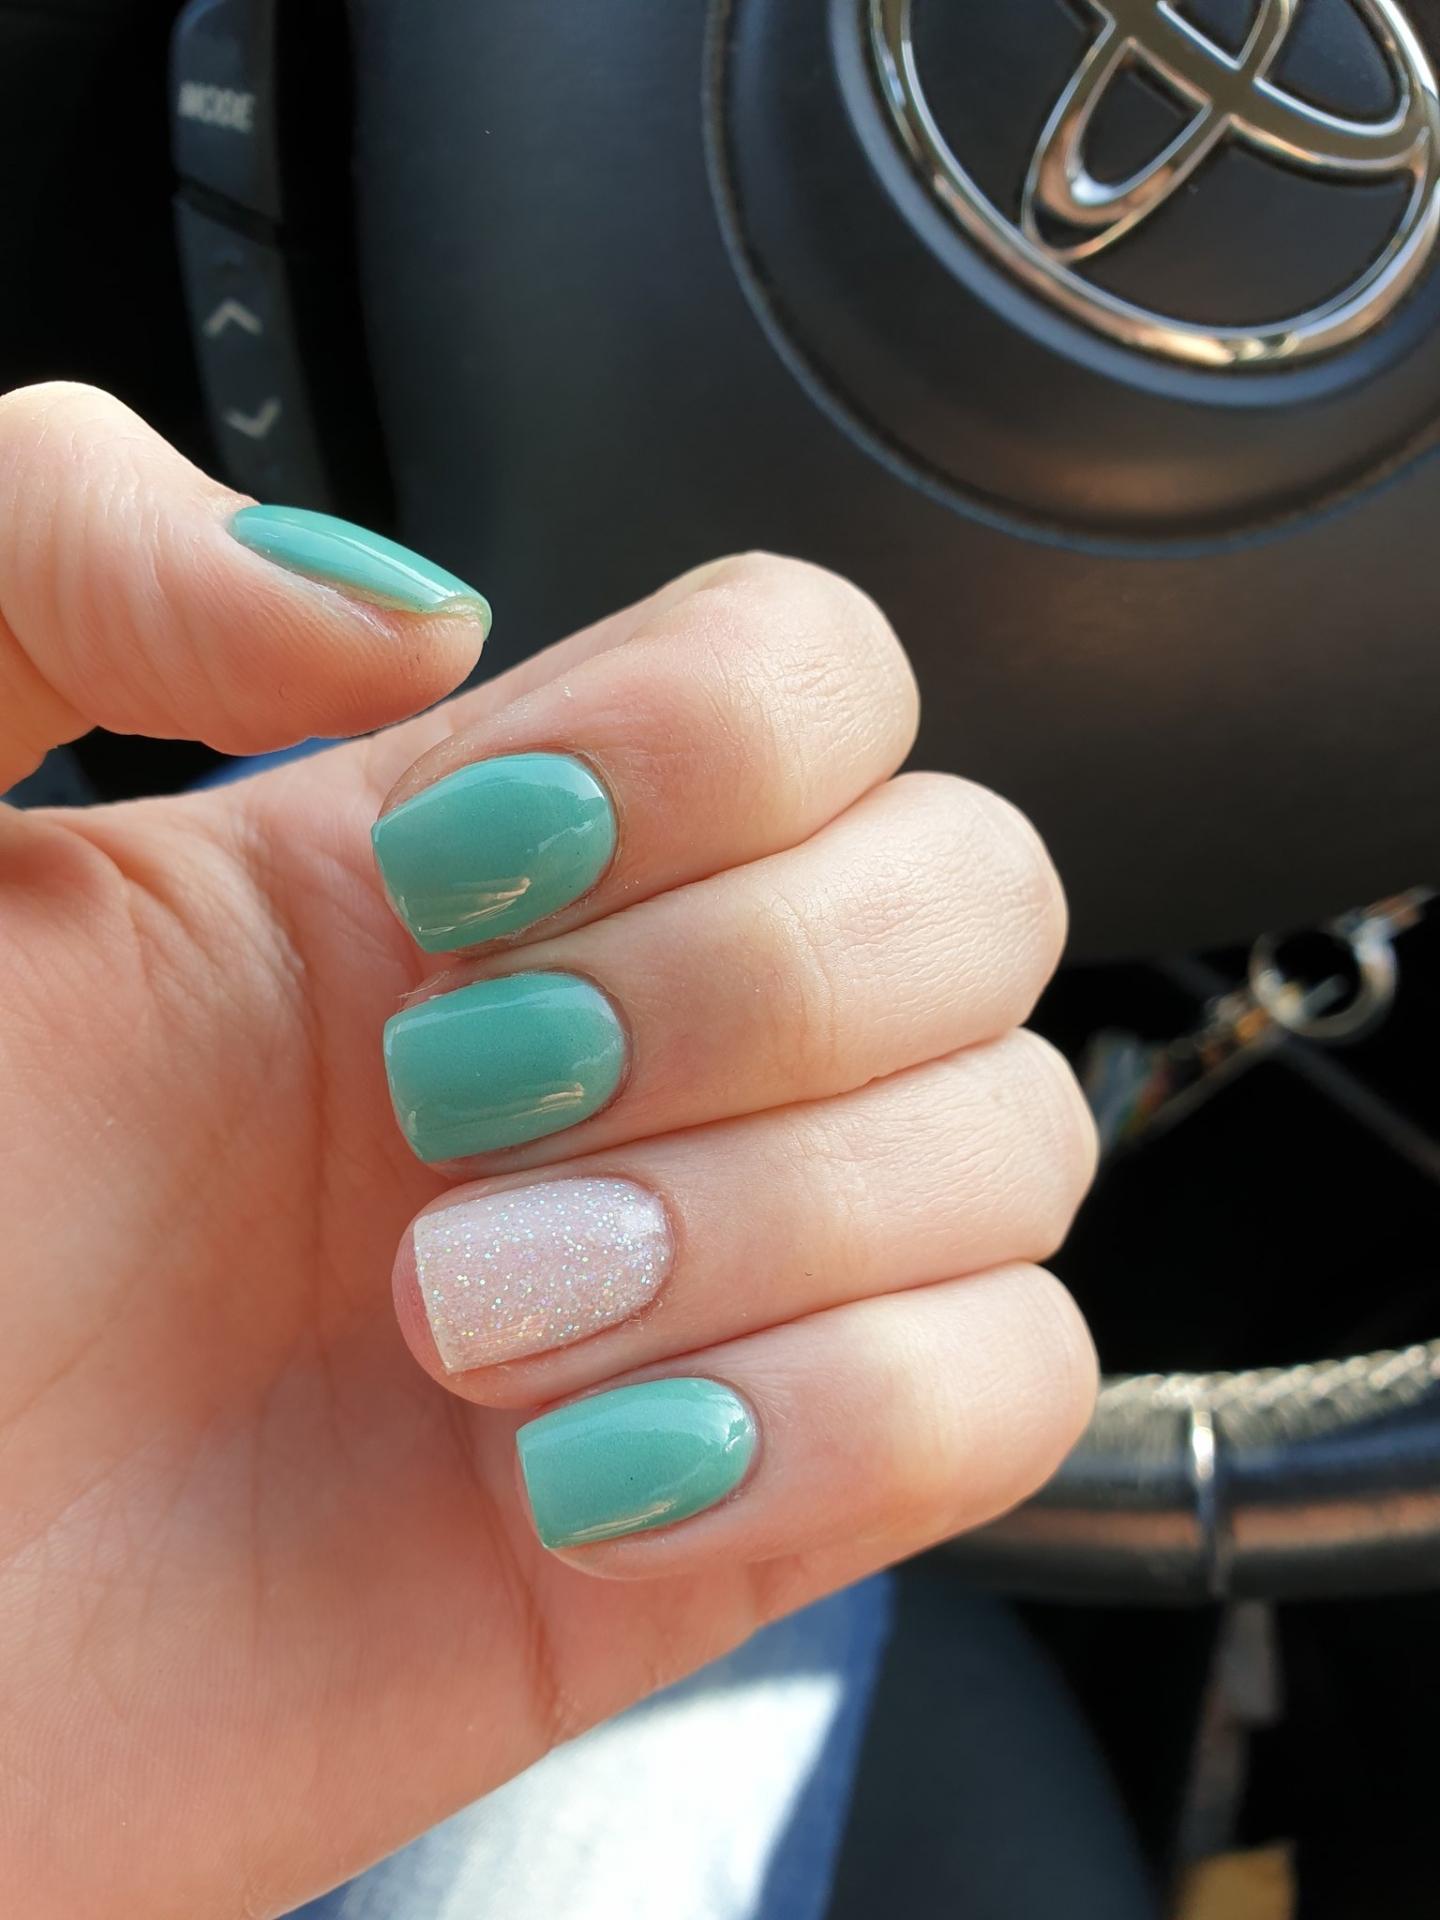 Mint green white glitter SNS manicure